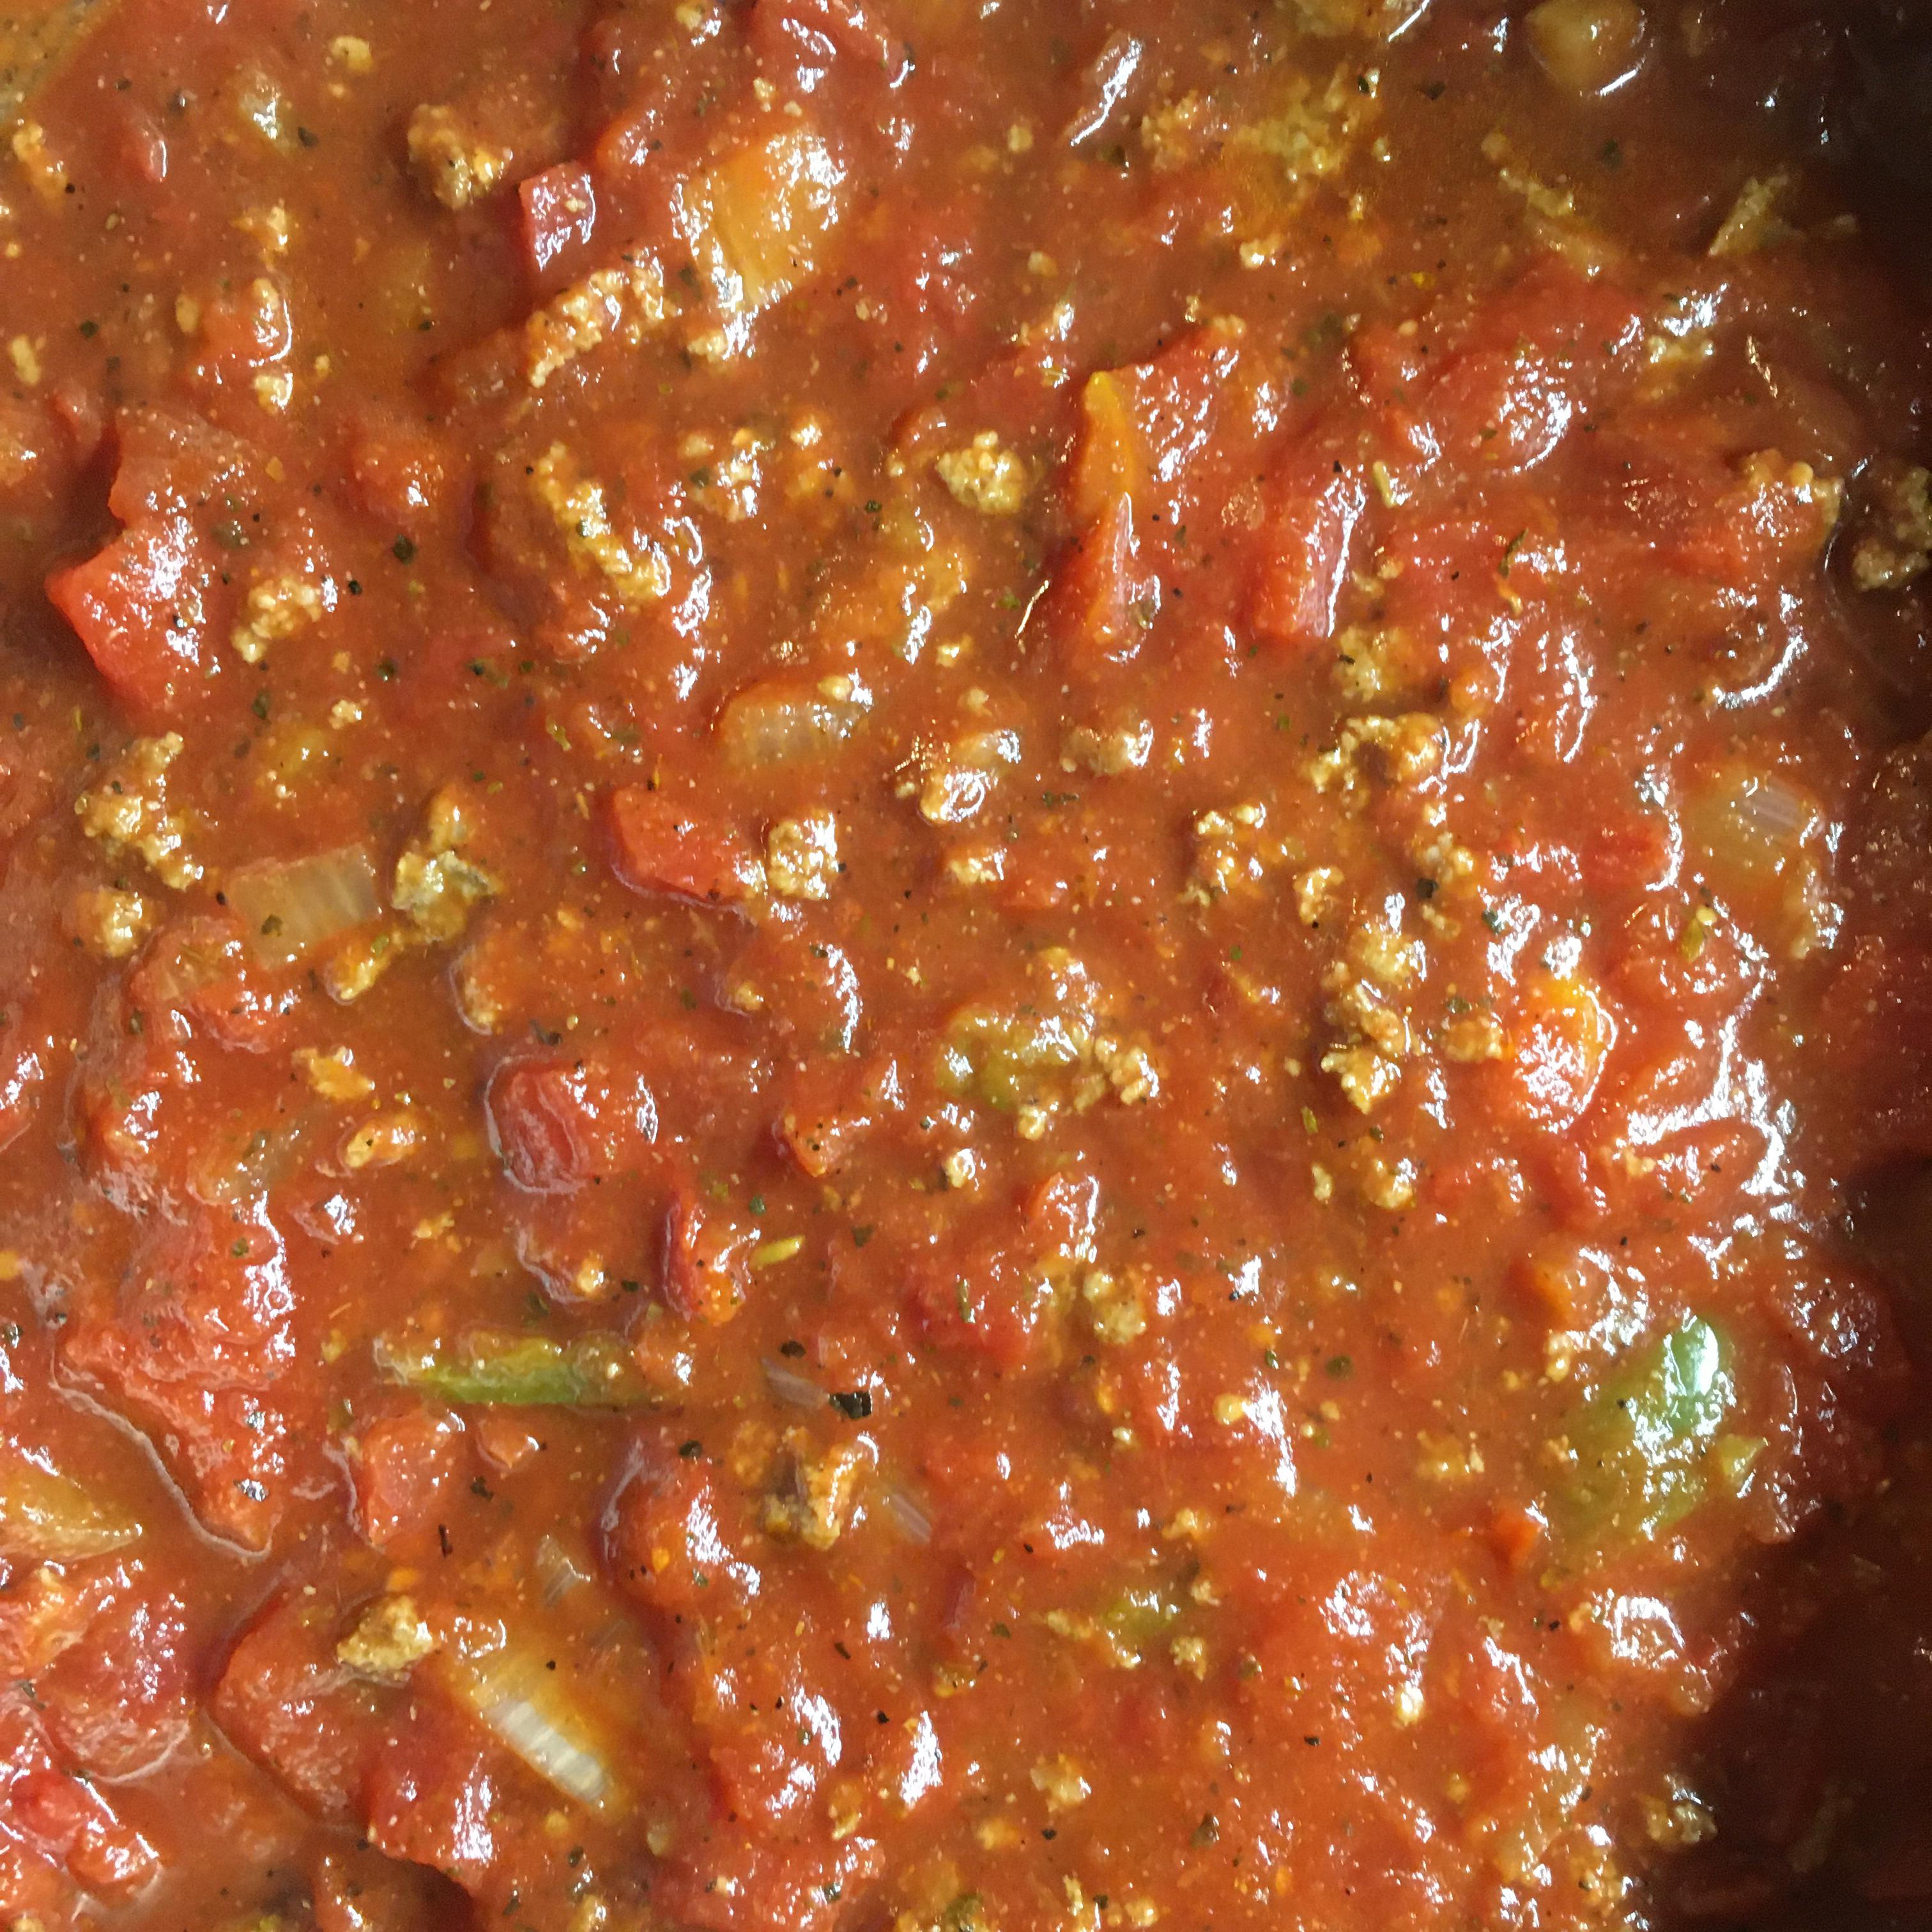 Spaghetti Sauce with Ground Beef Cindy Croal